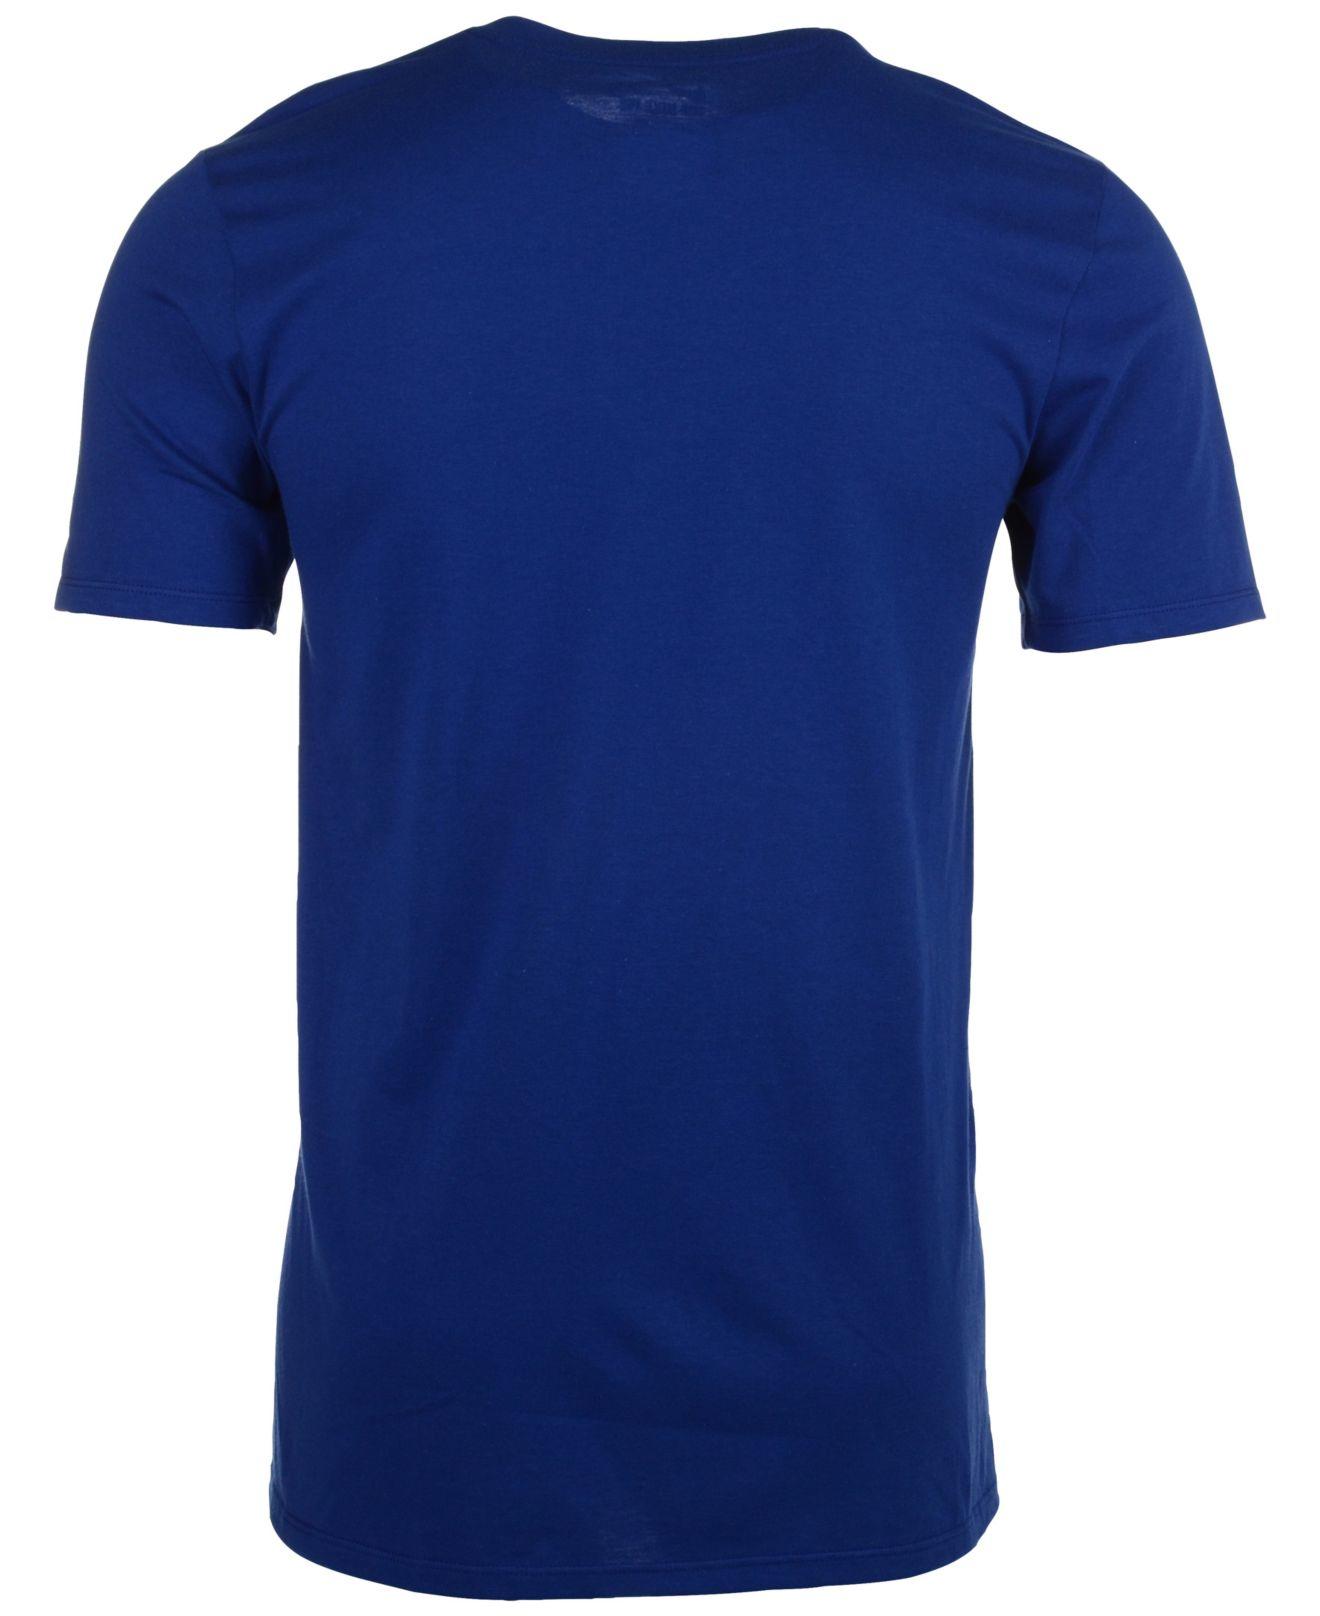 Plain Navy Blue T Shirt Mens   ANLIS